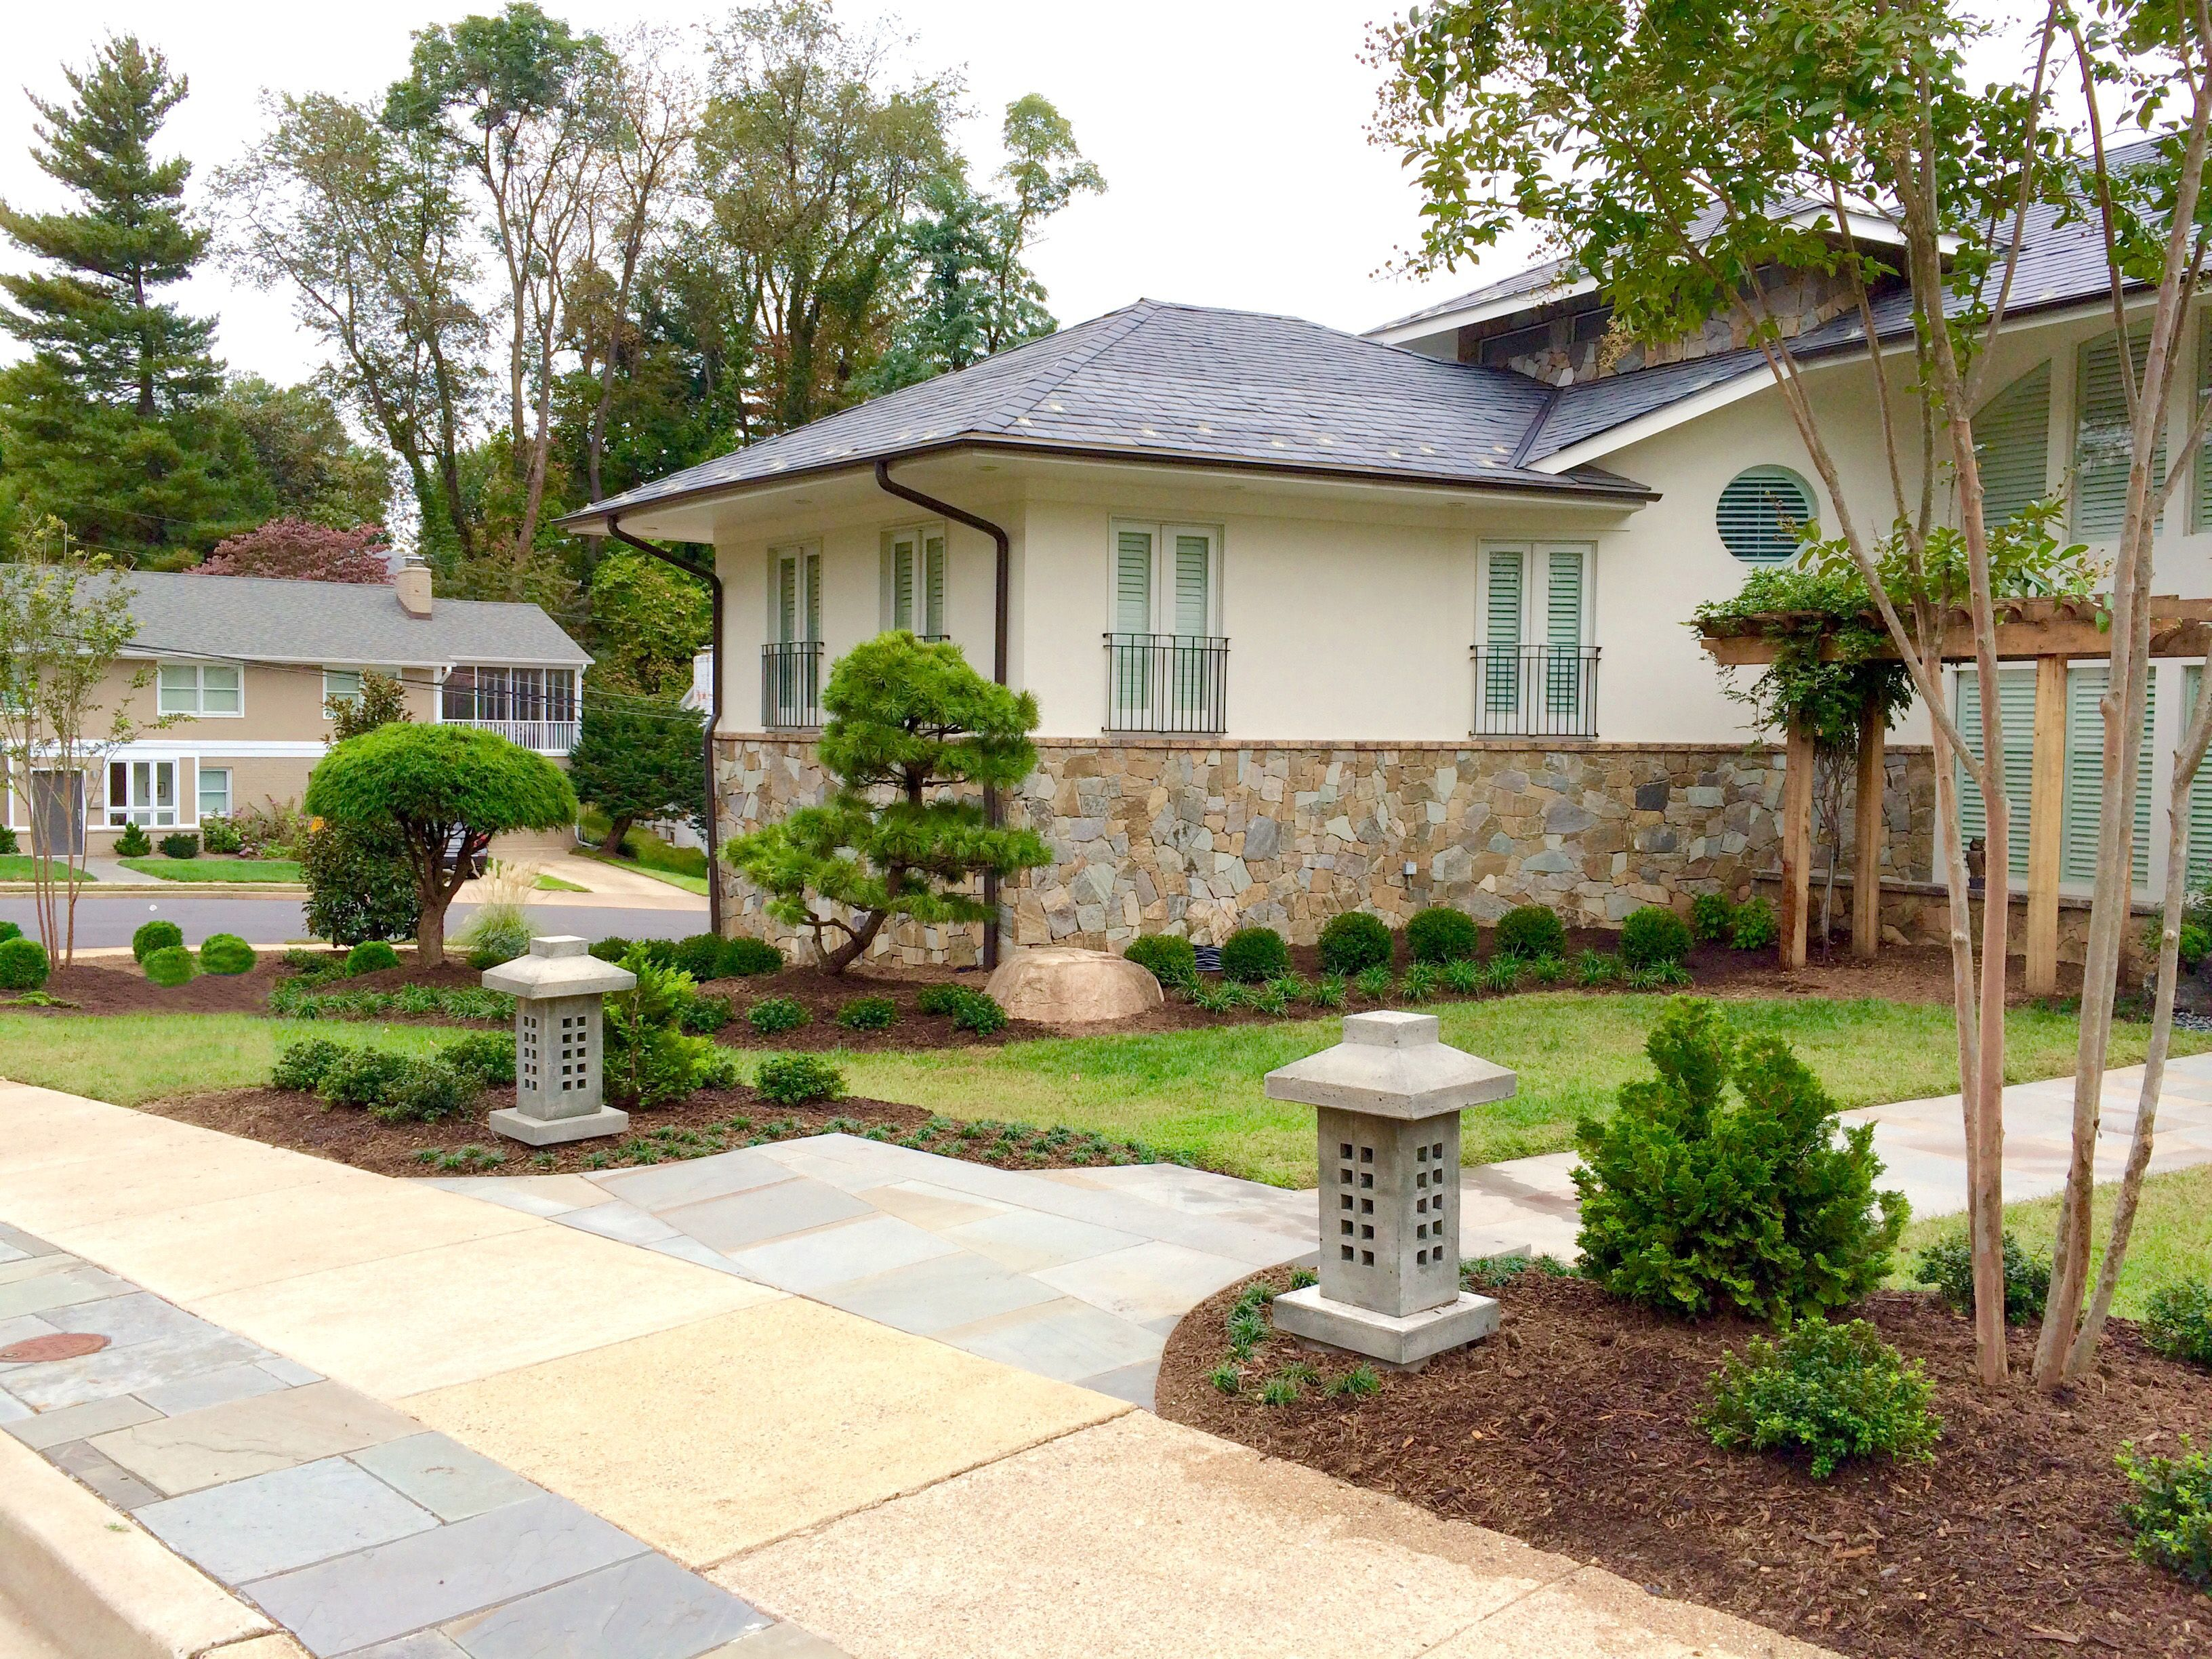 Japanese Garden Front Entrance Design Japanese Garden Design Japanese Garden Japanese Landscape